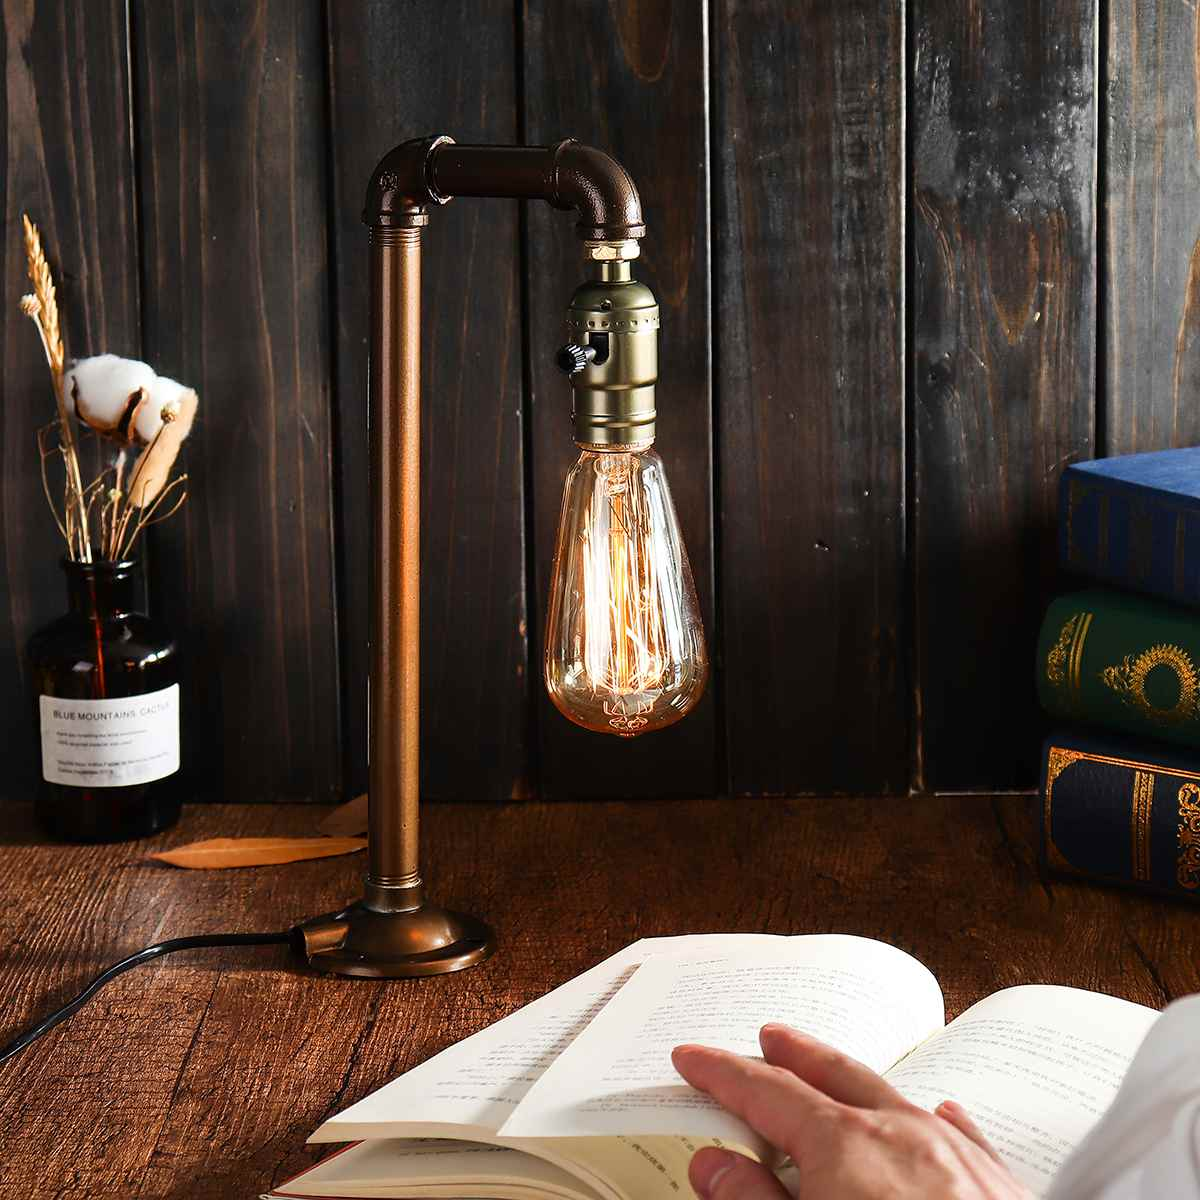 Water Pipe Industrial Table Lamp E27 Bulb Light Vintage Desk Table Lantern Lamp Fixture Indoor Lighting Home Bedroom Decoration